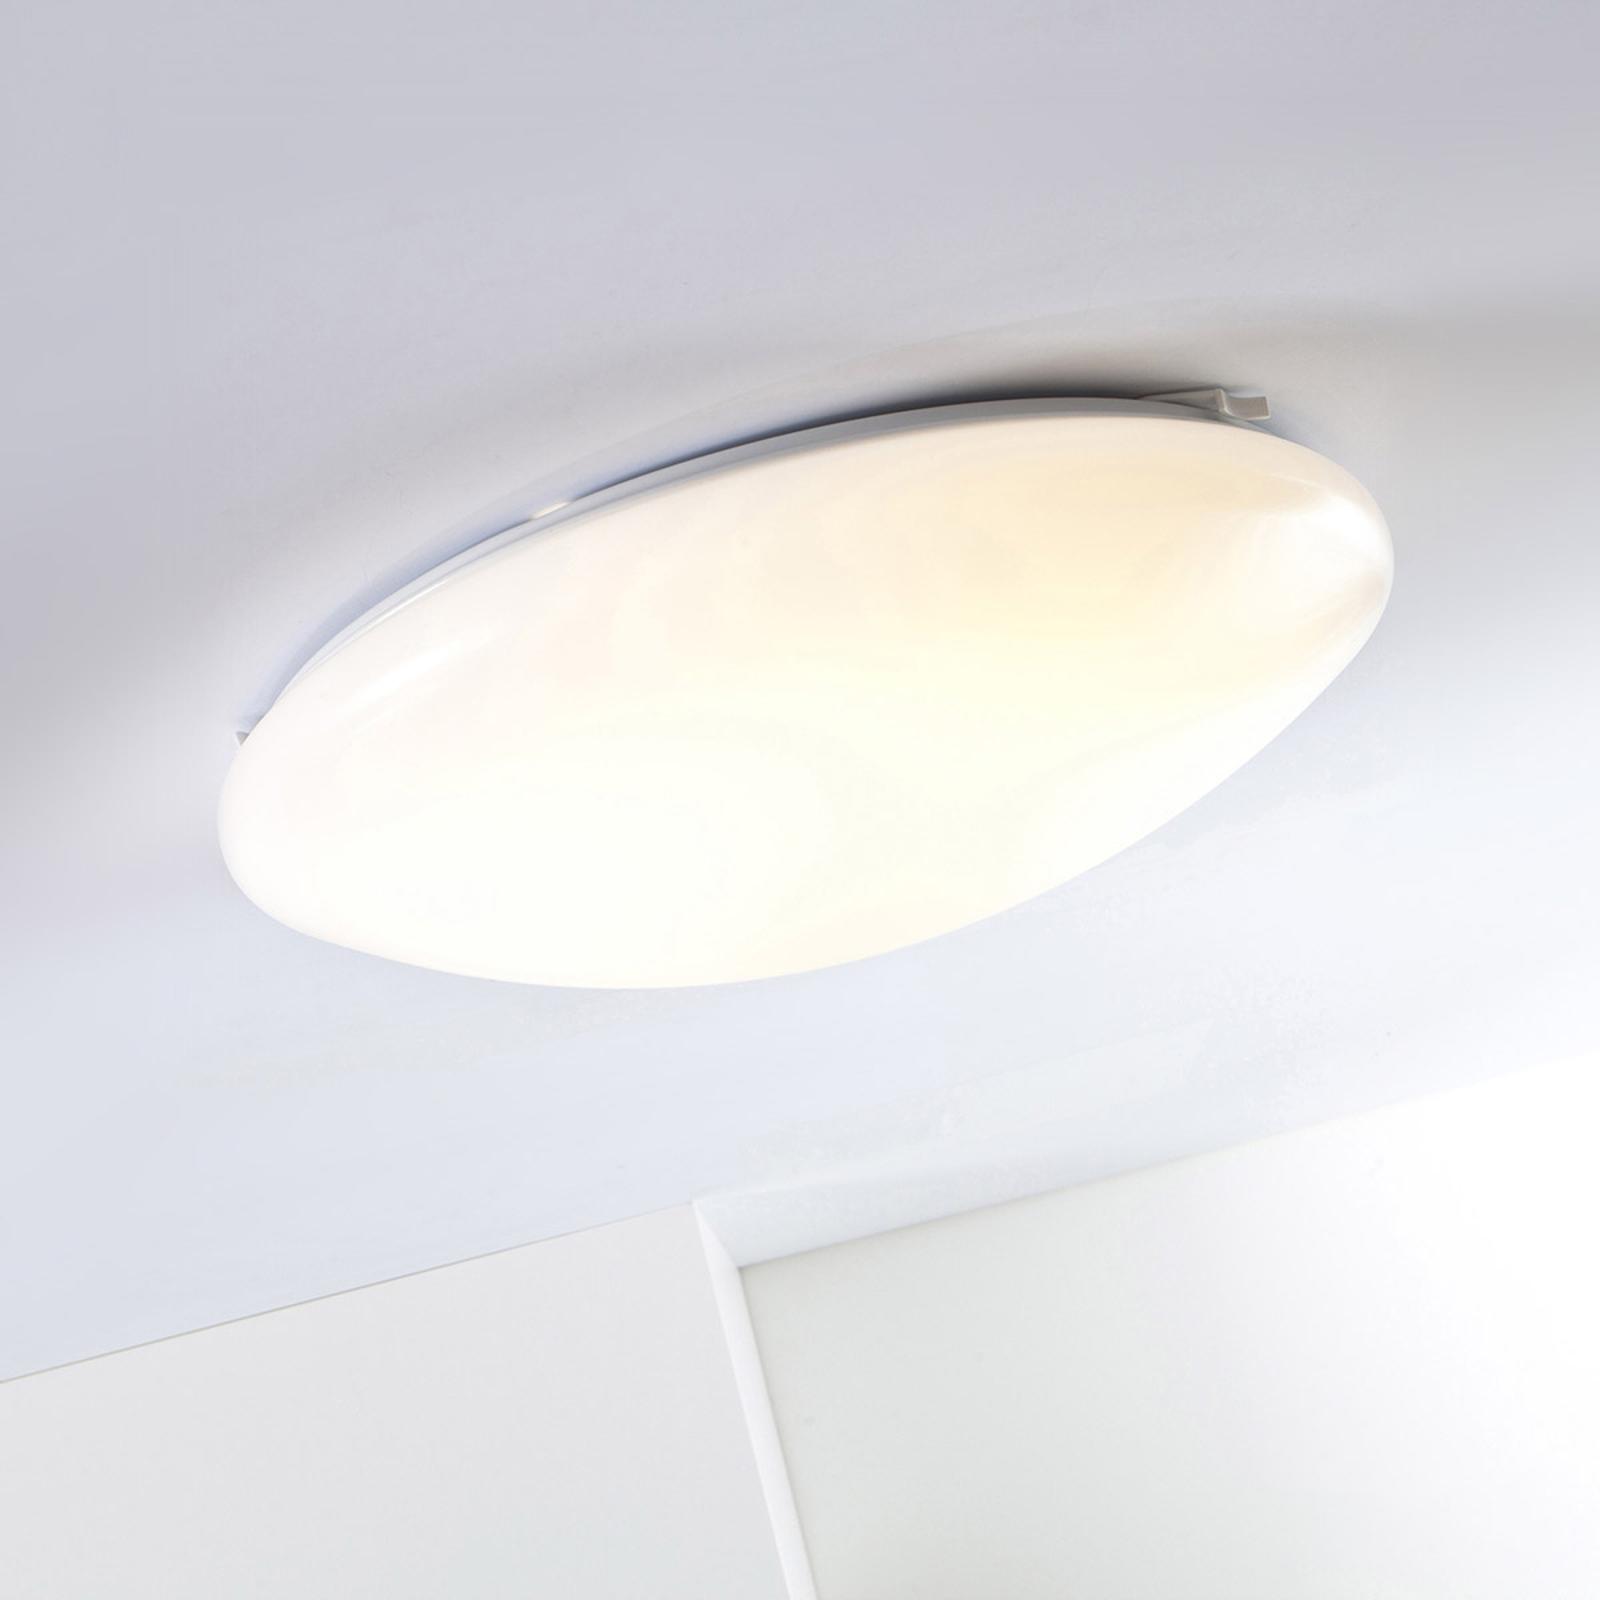 AEG LED Basic okrúhle stropné svietidlo, 14W_3057001_1